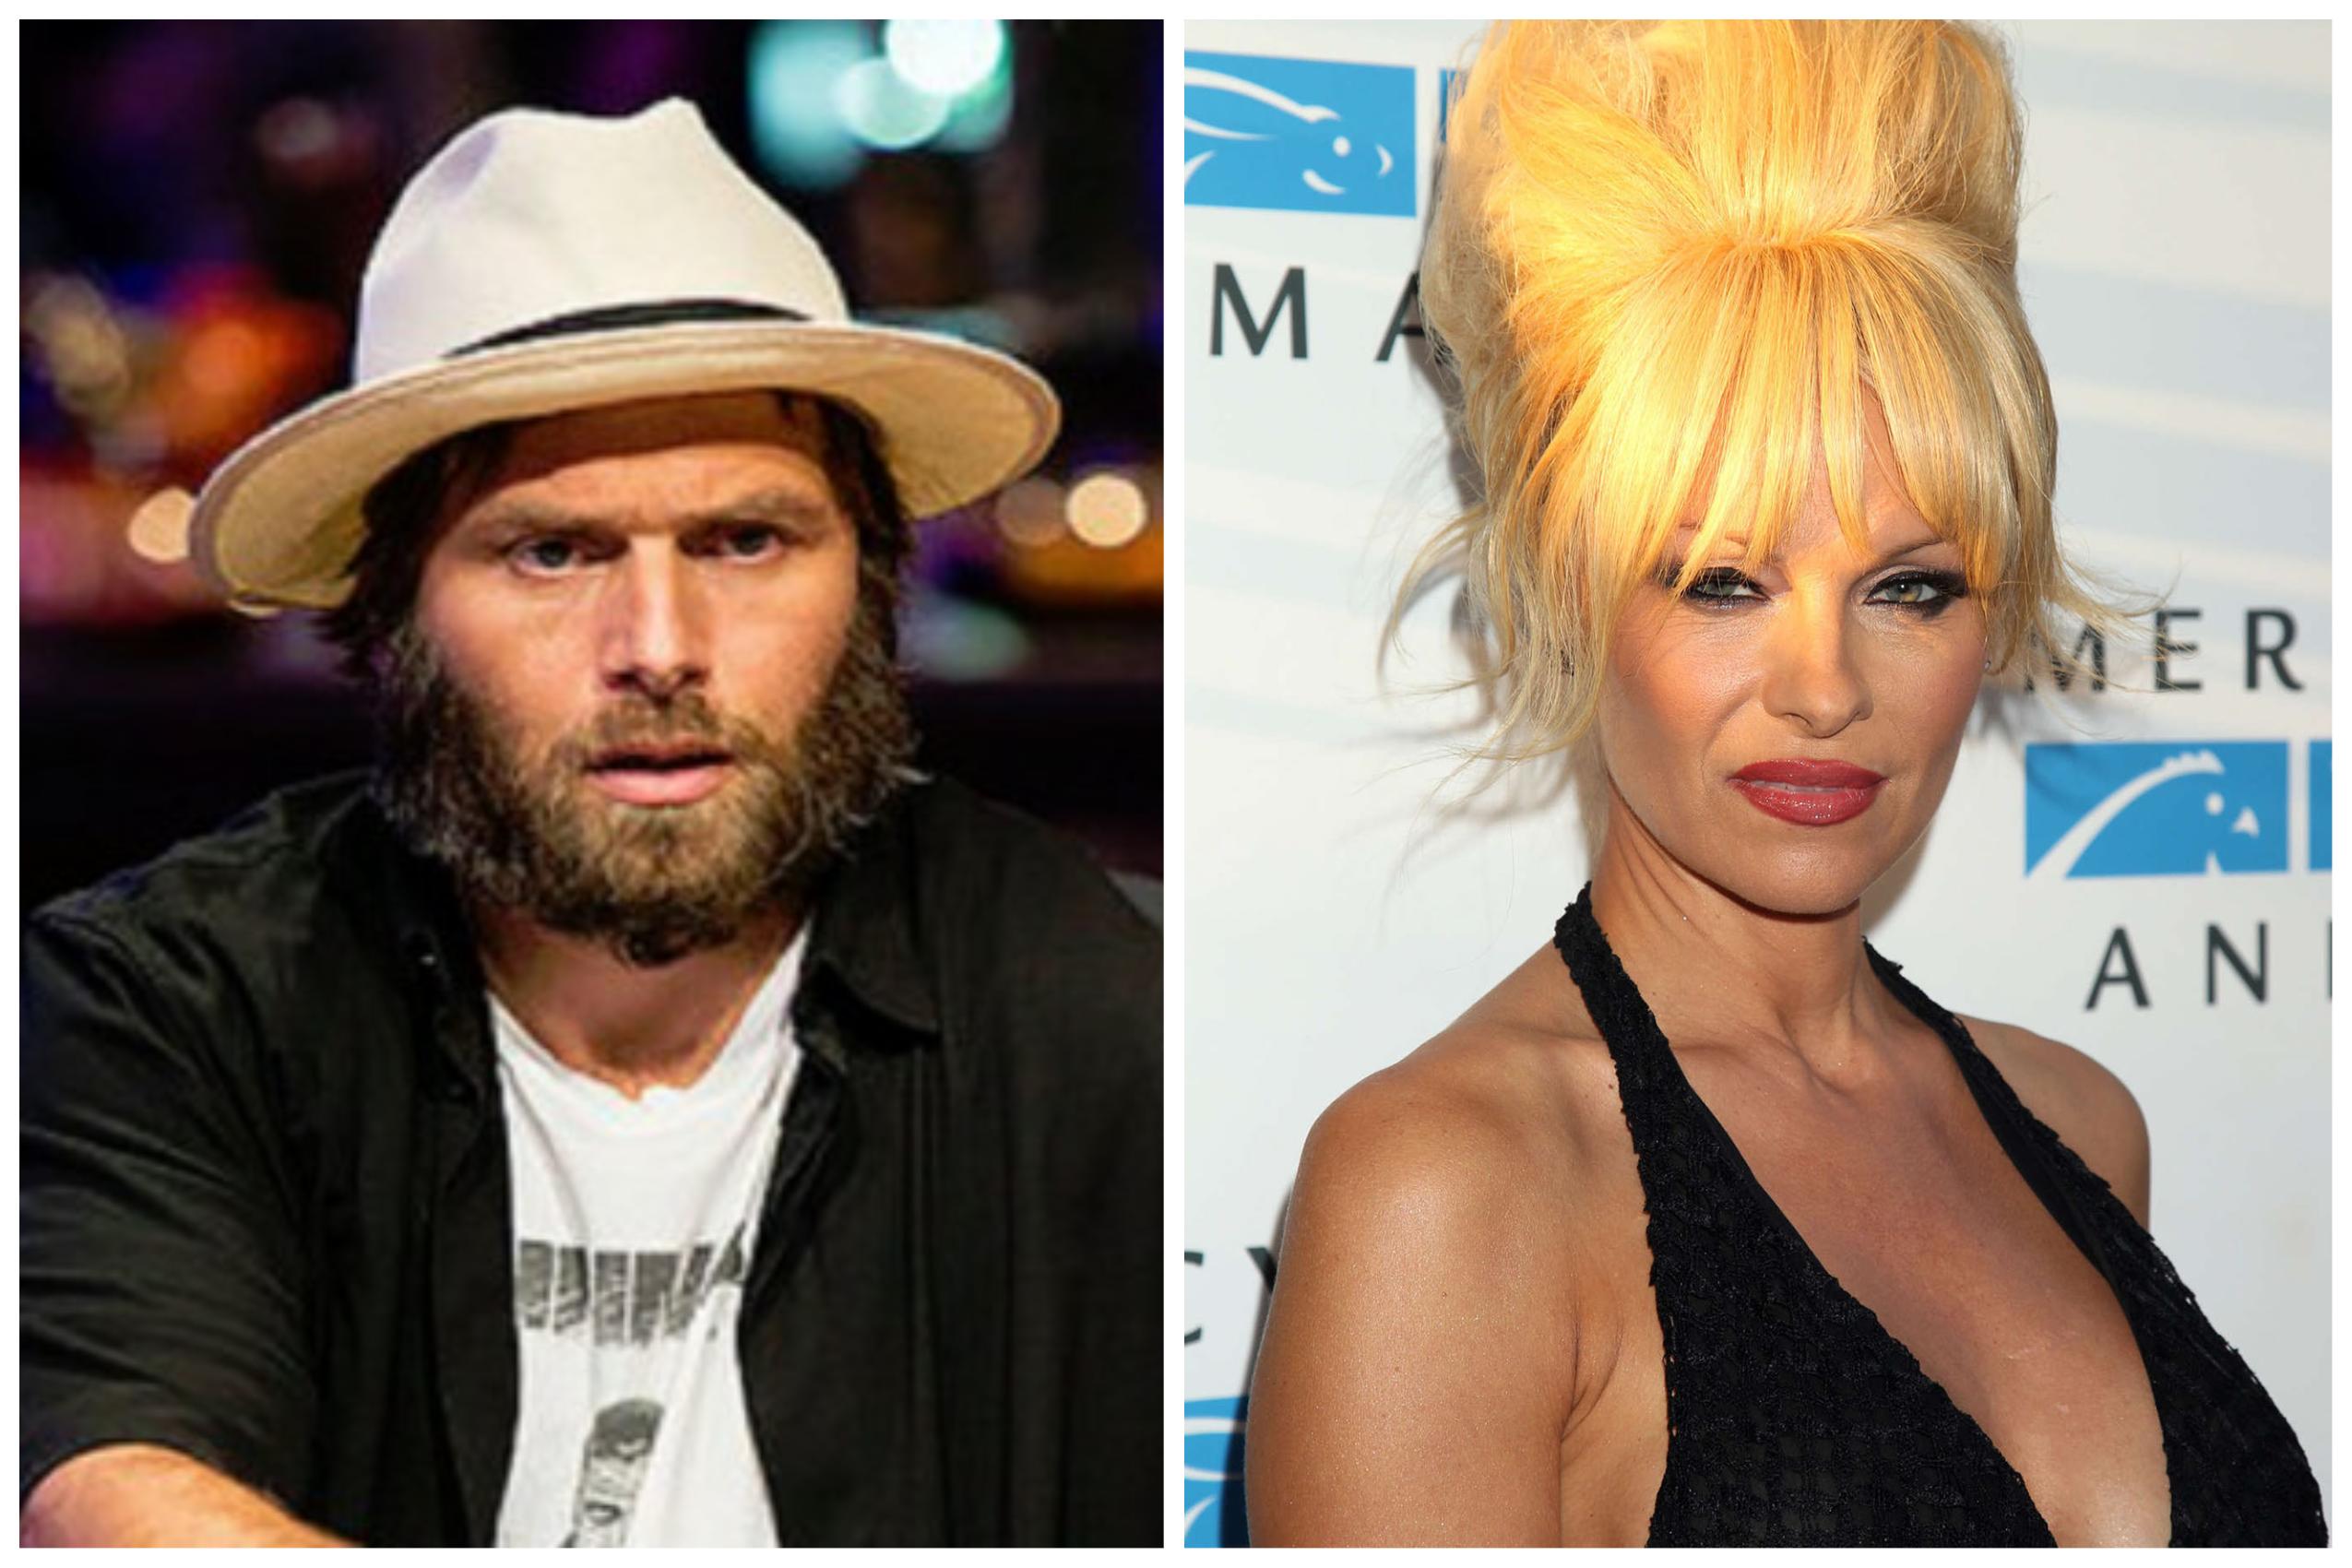 Pamela Anderson's third husband Rick Salomon